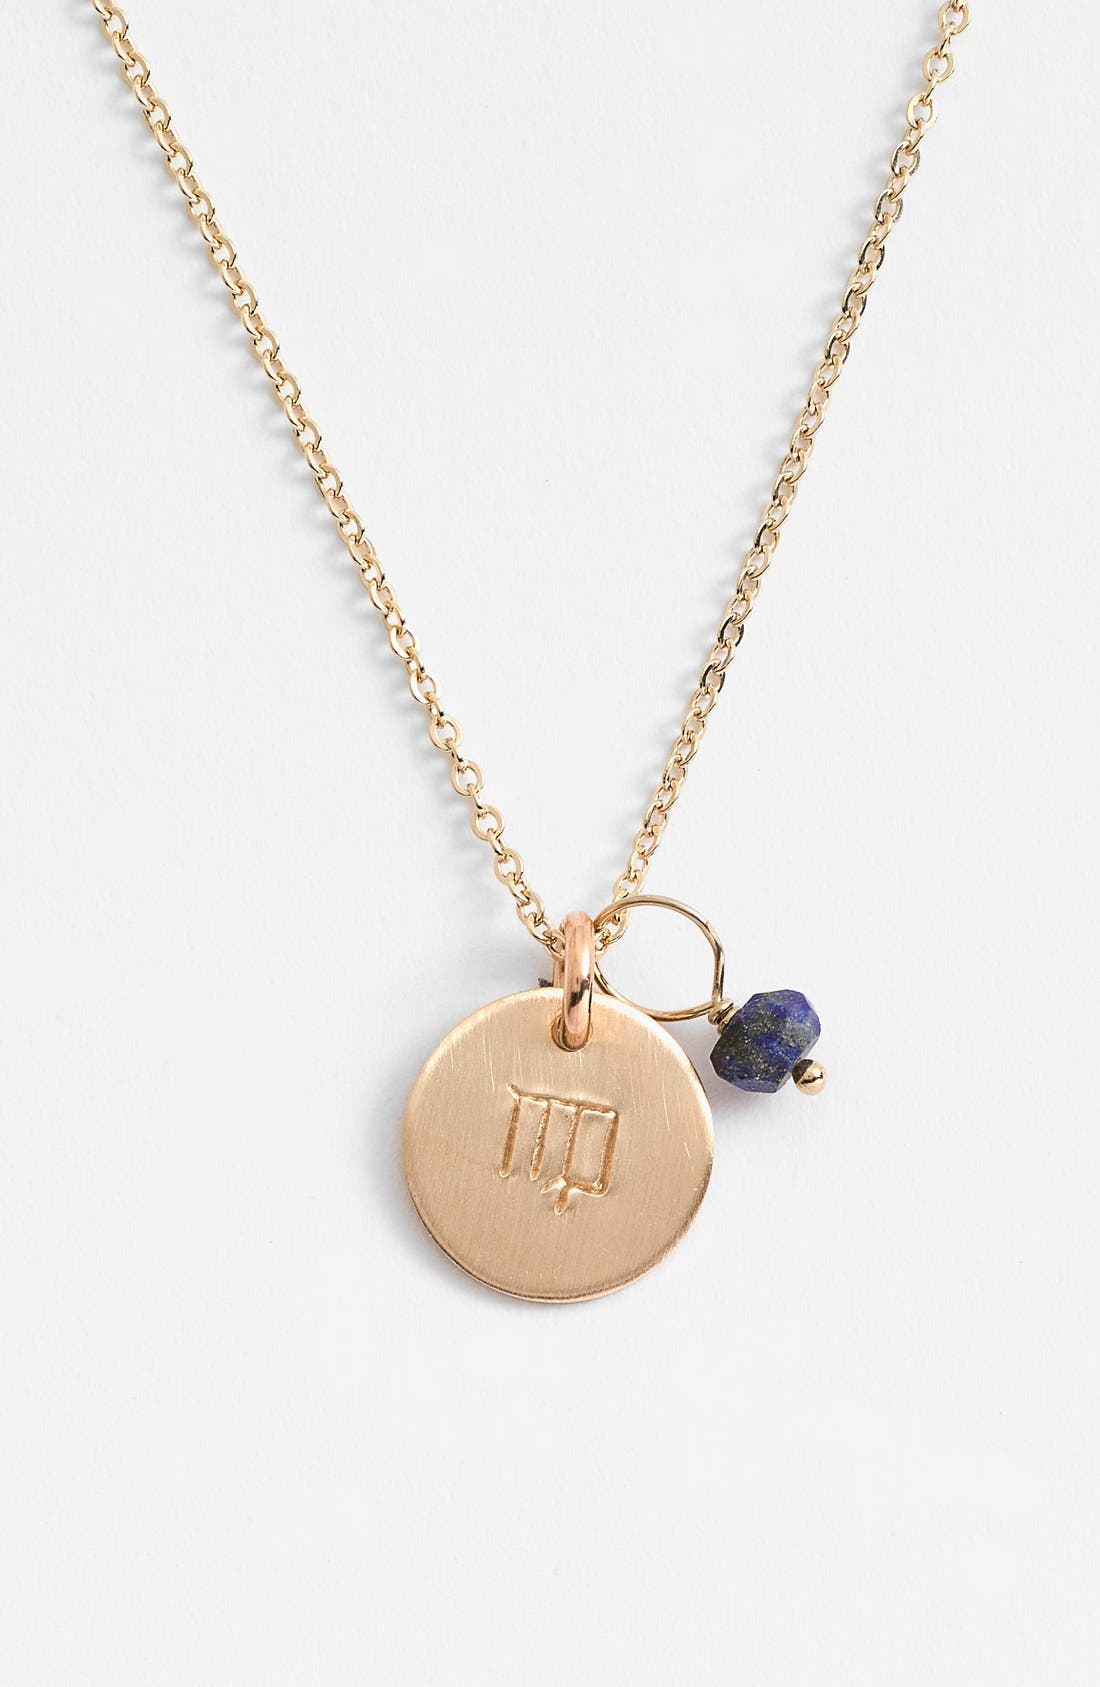 Main Image - Nashelle 14k-Gold Fill & Semiprecious Birthstone Zodiac Mini Disc Necklace